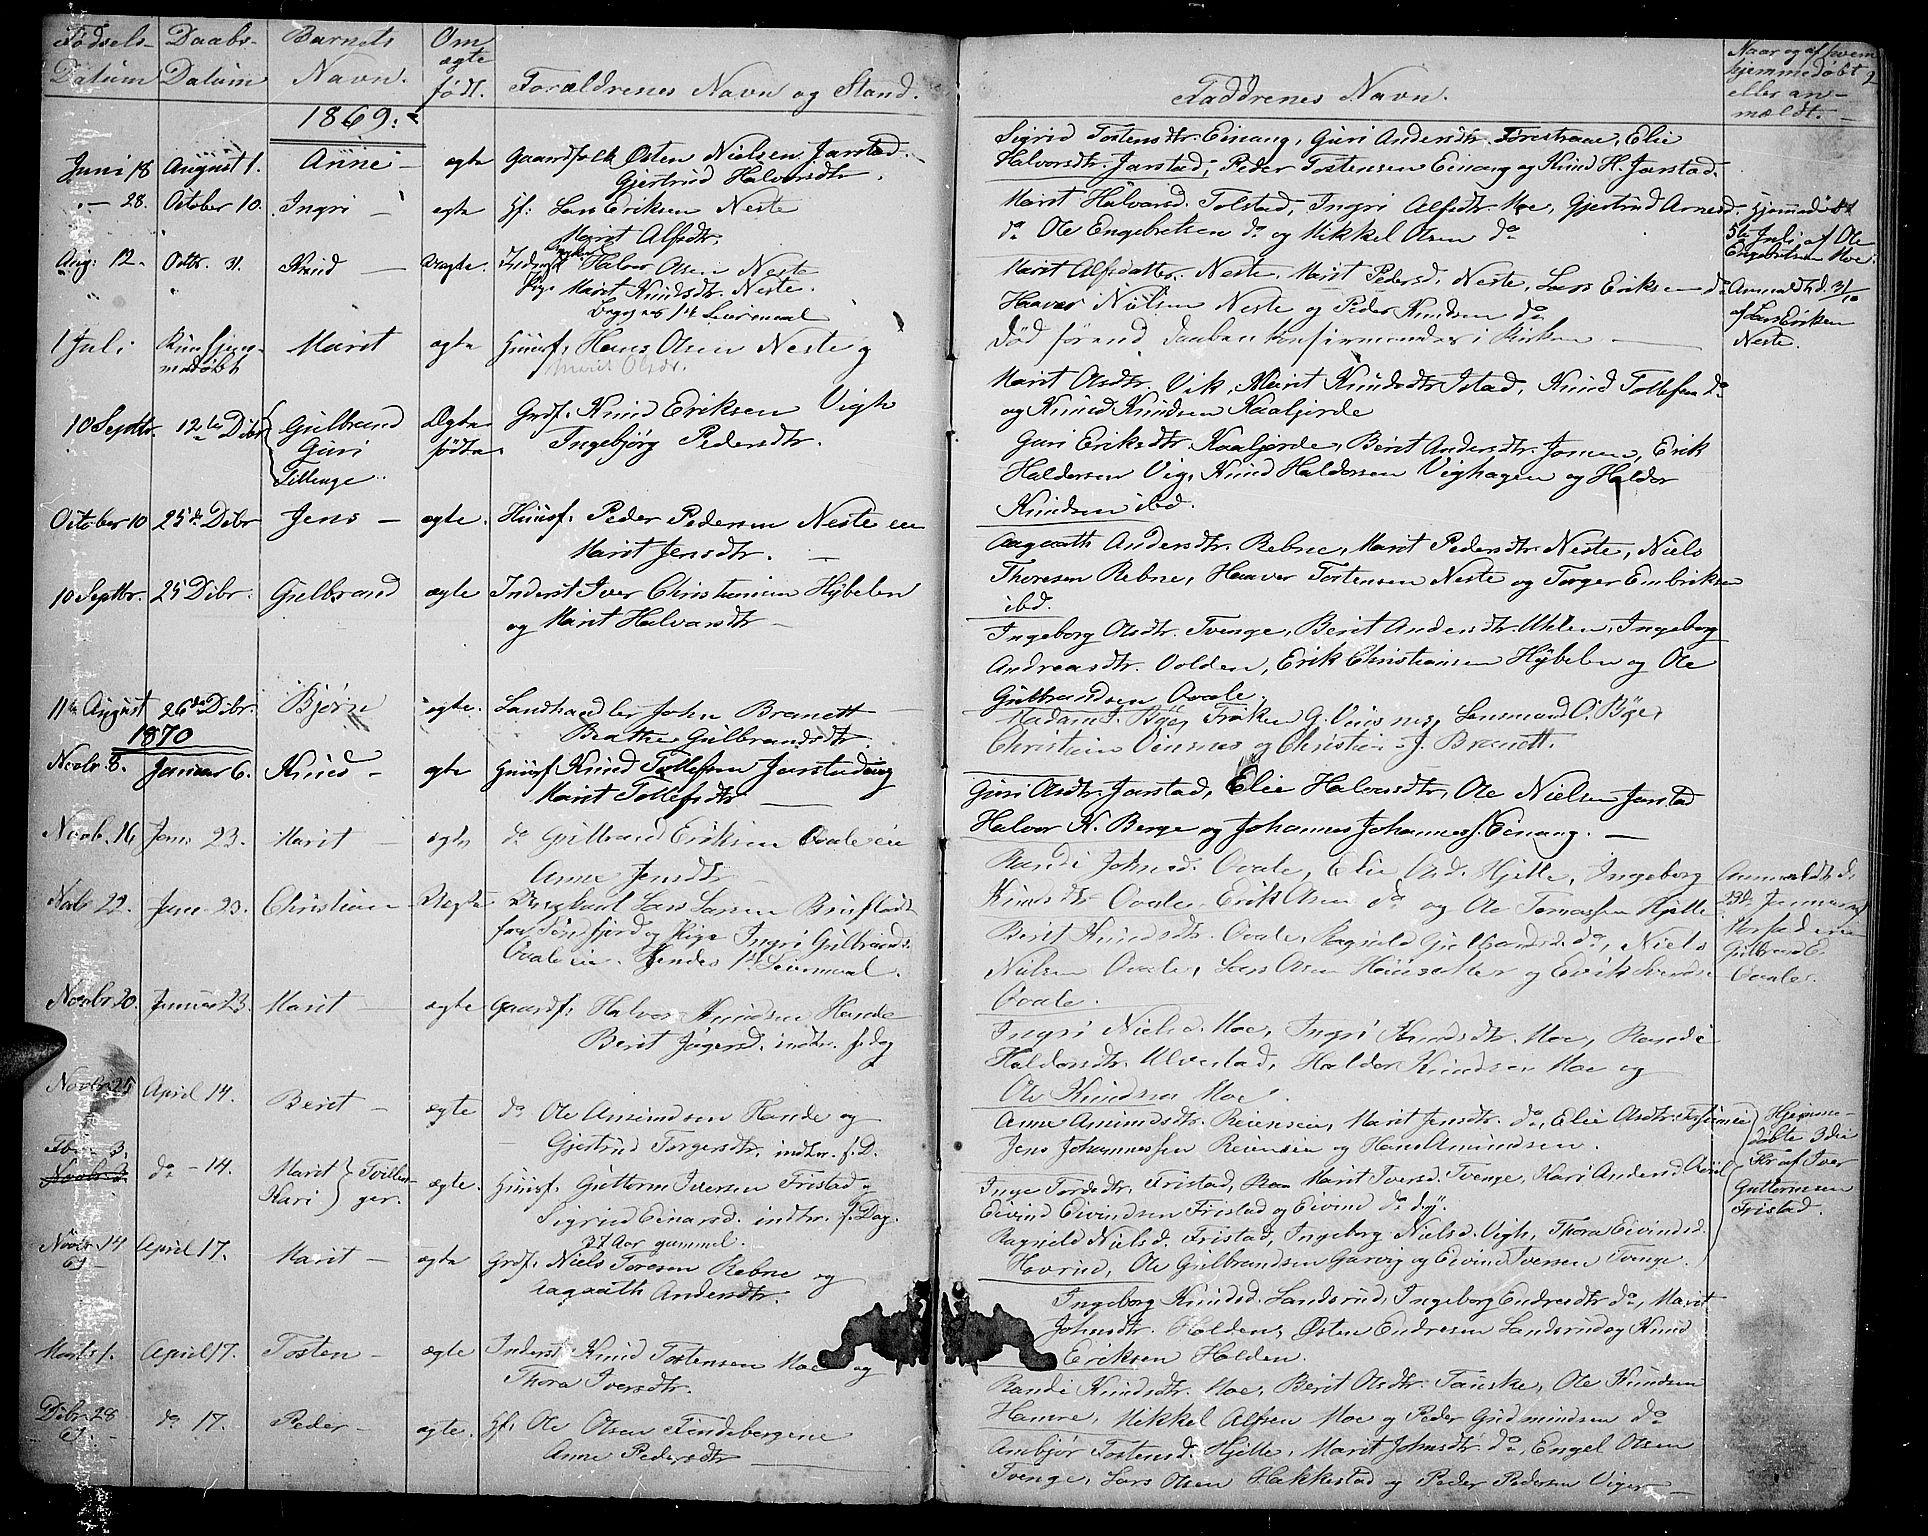 SAH, Vestre Slidre prestekontor, Klokkerbok nr. 1, 1869-1882, s. 2